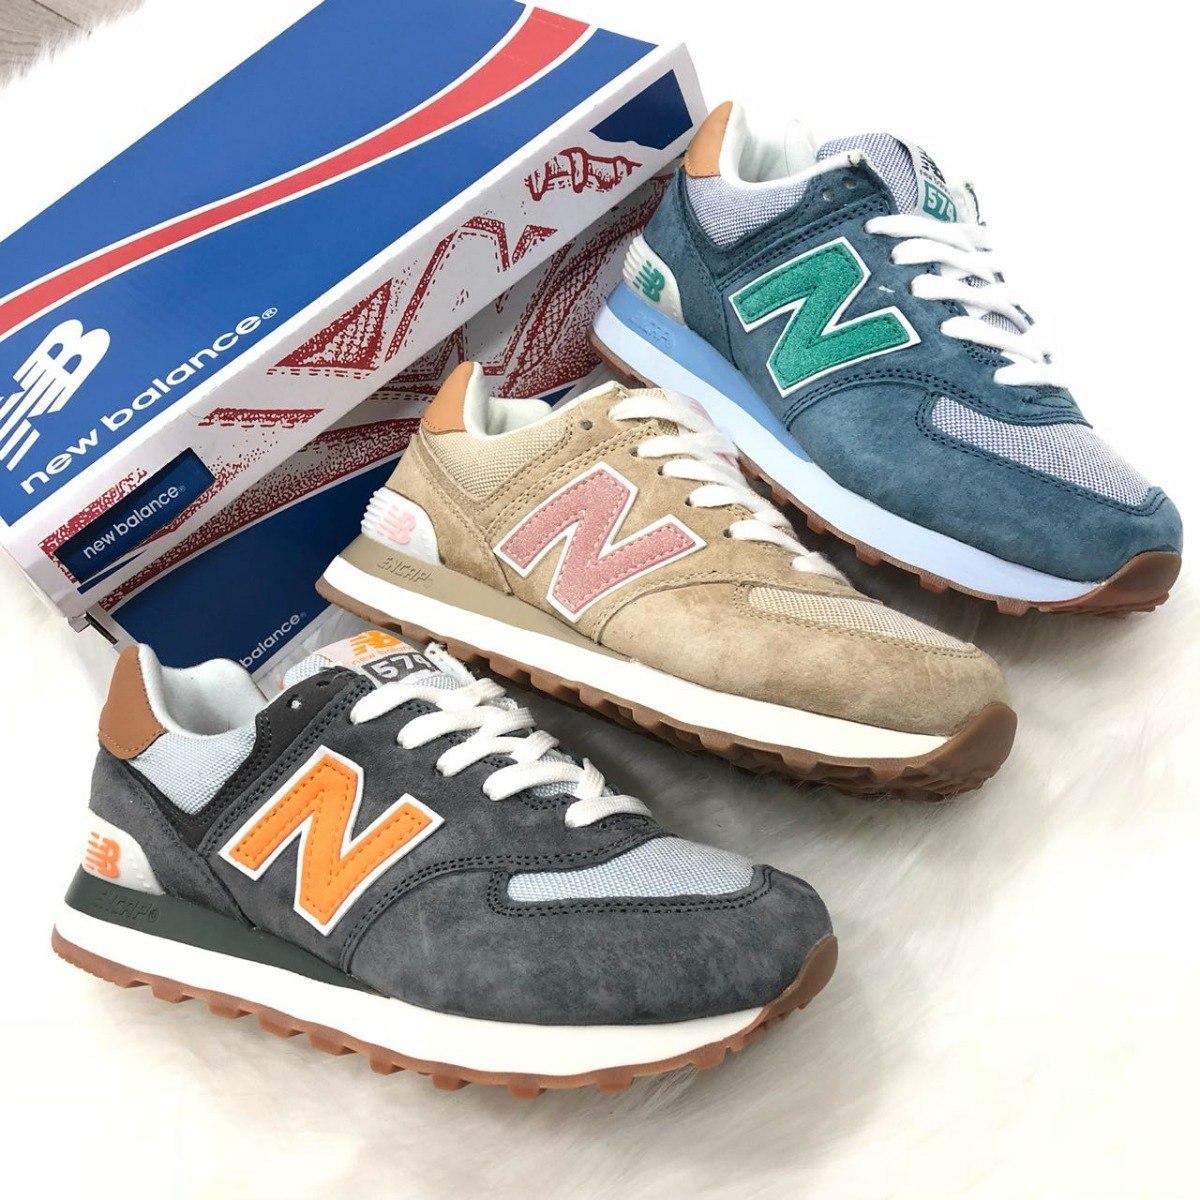 New Balance Zapatillas 574 Varios colores